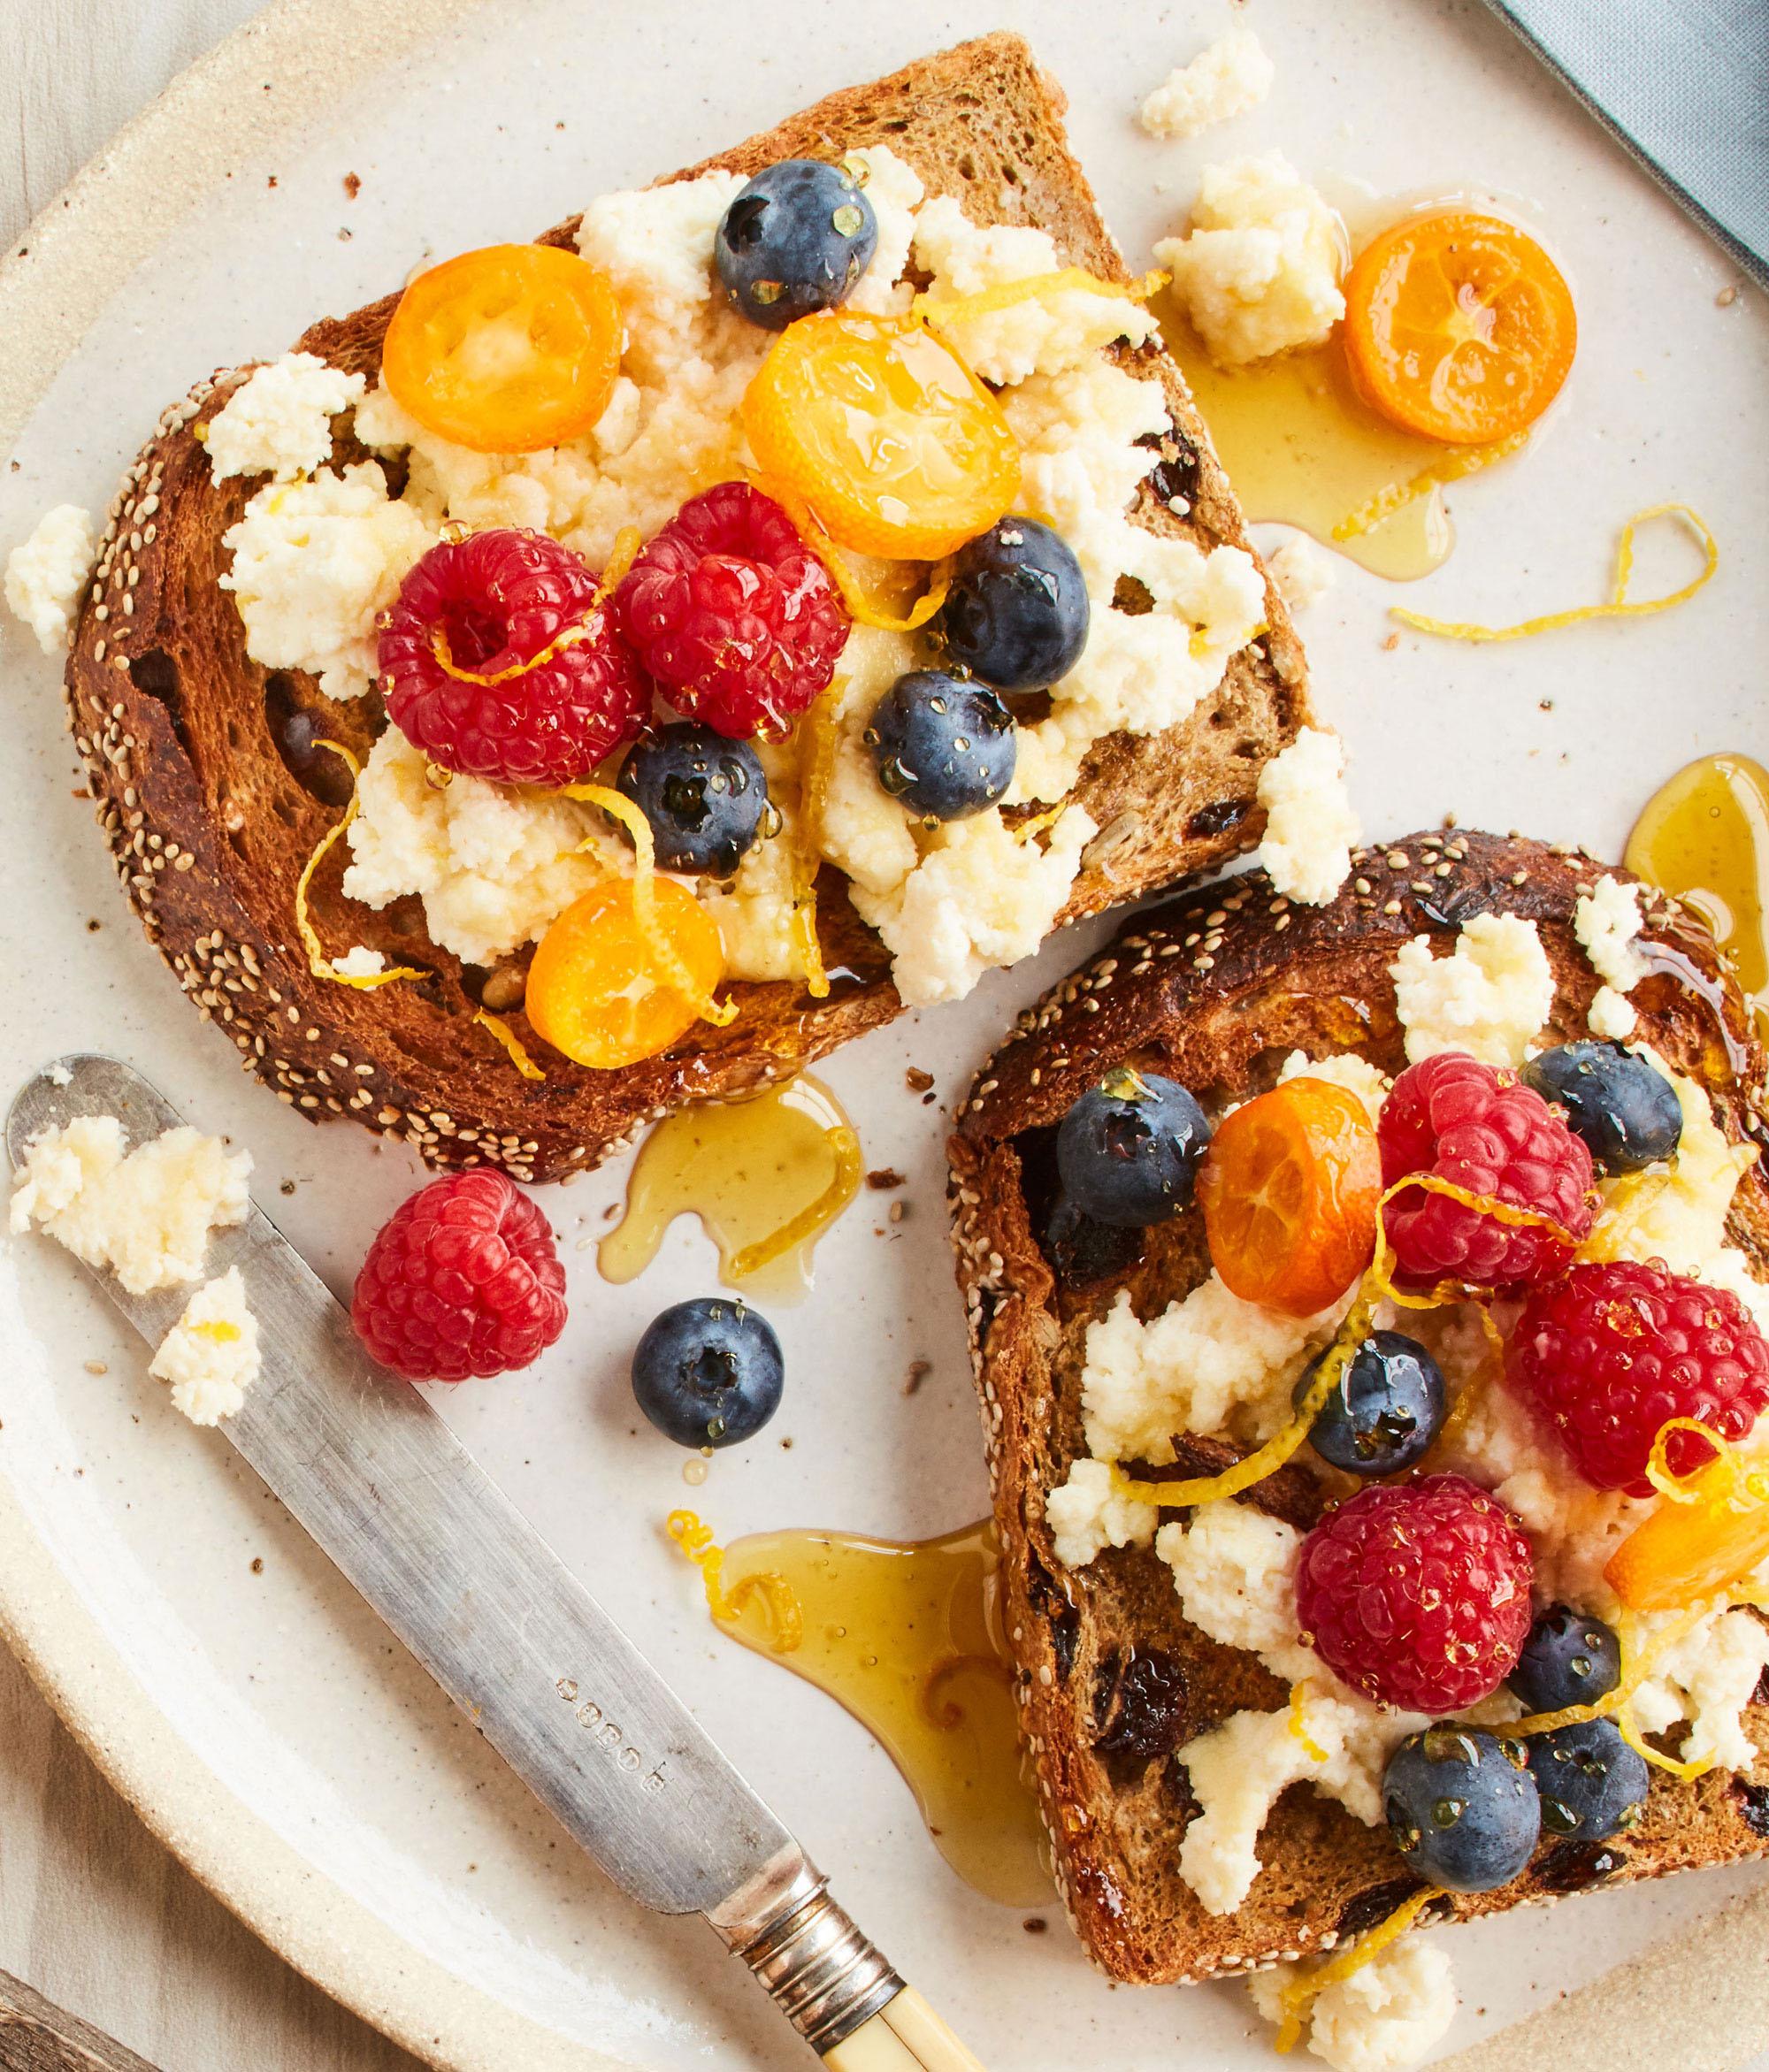 Fruit toast, food styling